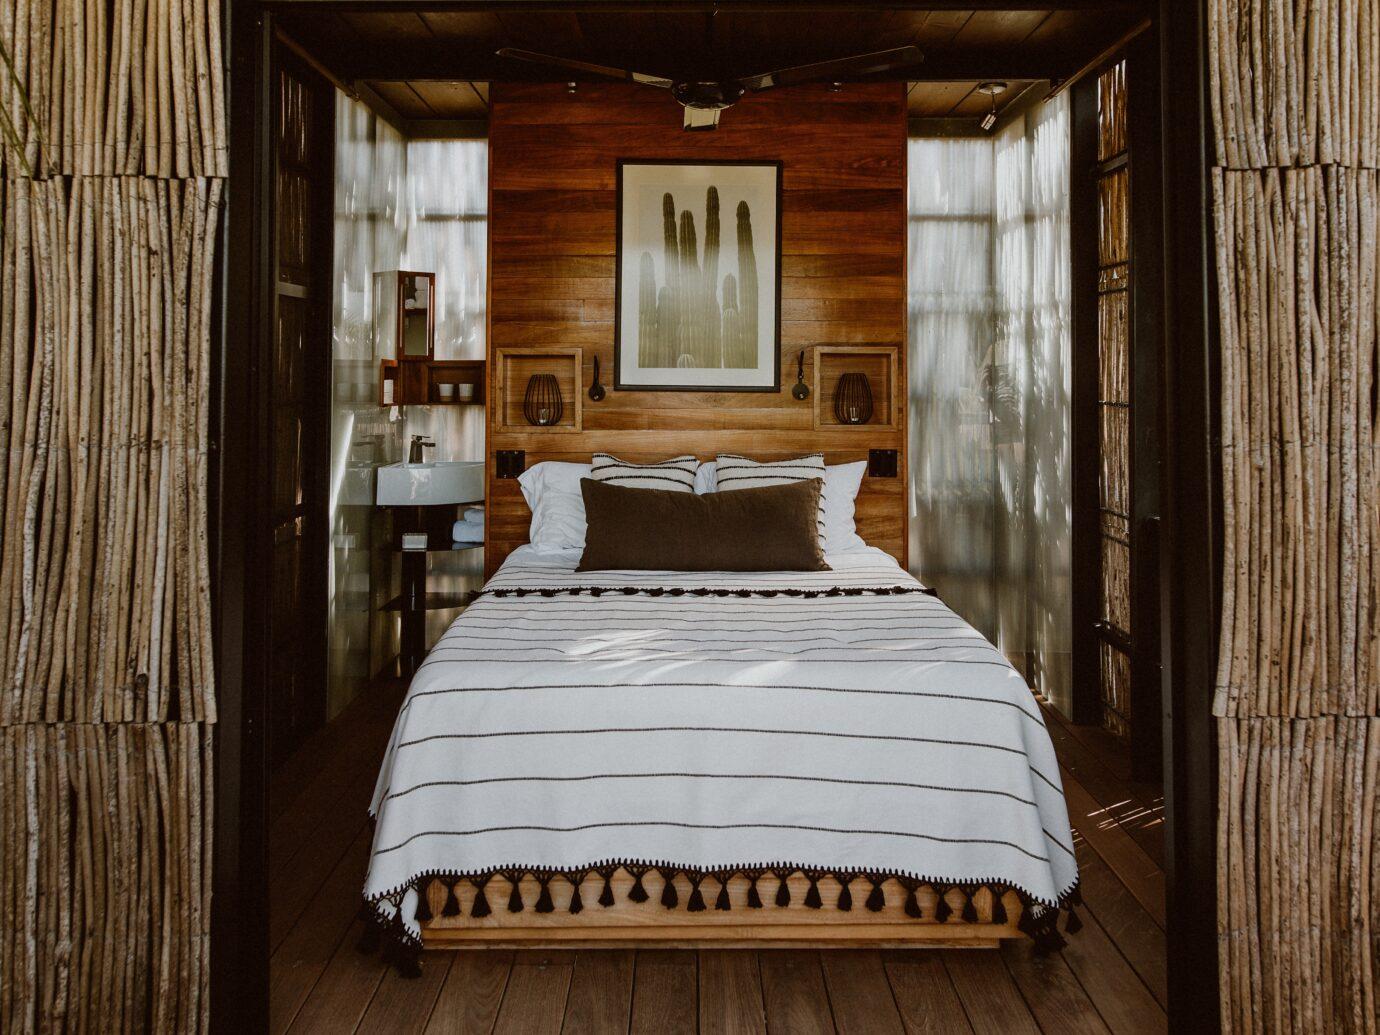 Bedroom at Acre in Baja California